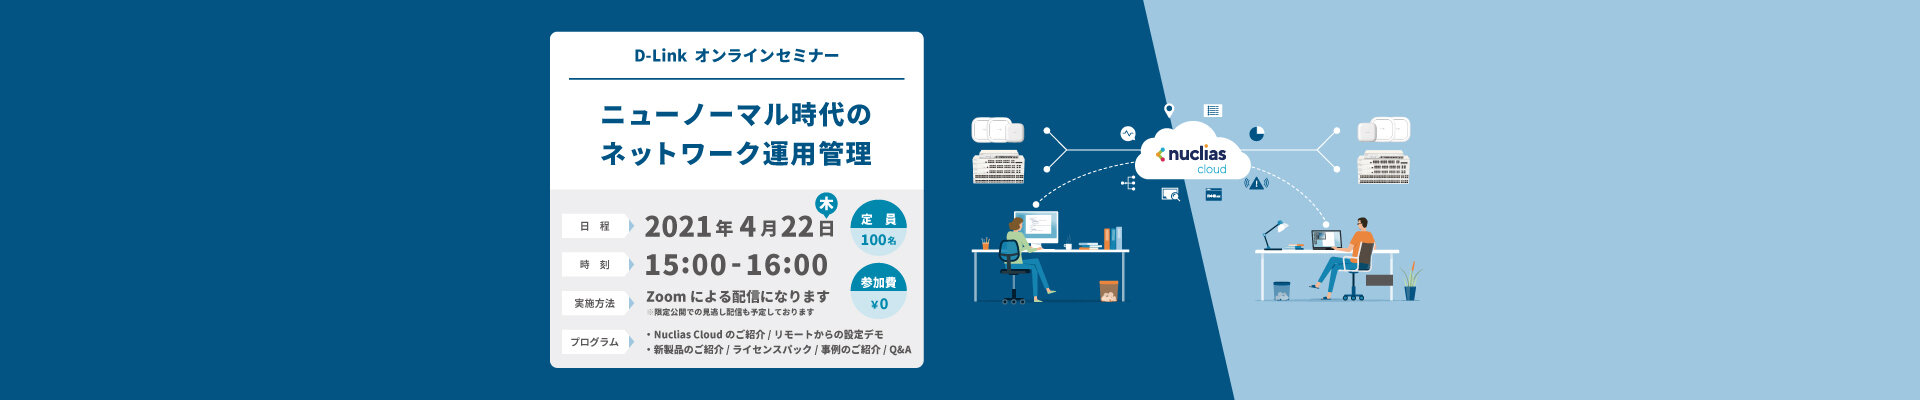 D-Linkオンラインセミナー「ニューノーマル時代のネットワーク運用管理」